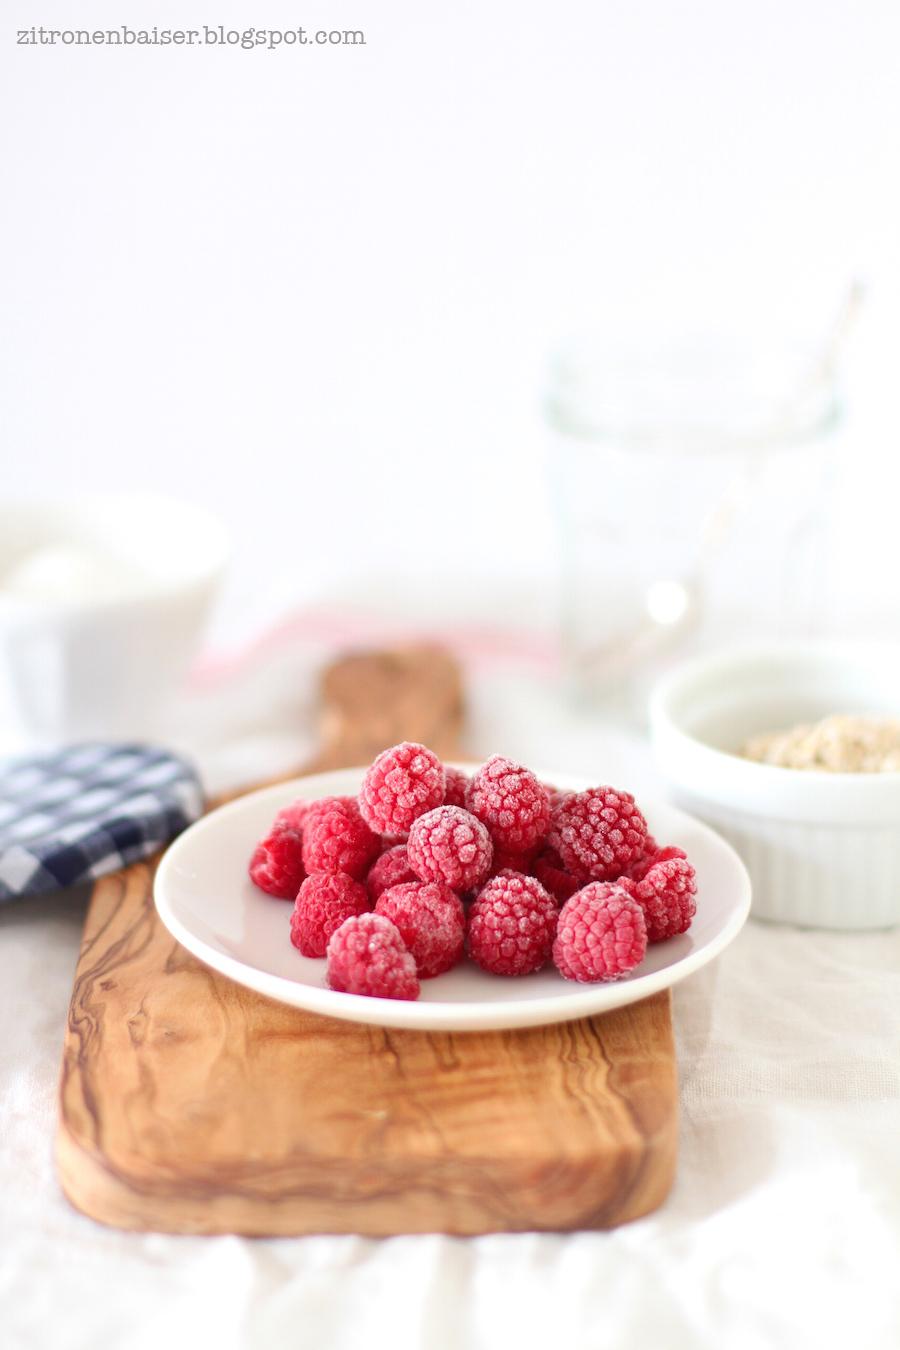 Rezept für Overnight Oats mit Himbeeren / Theresa Kellner